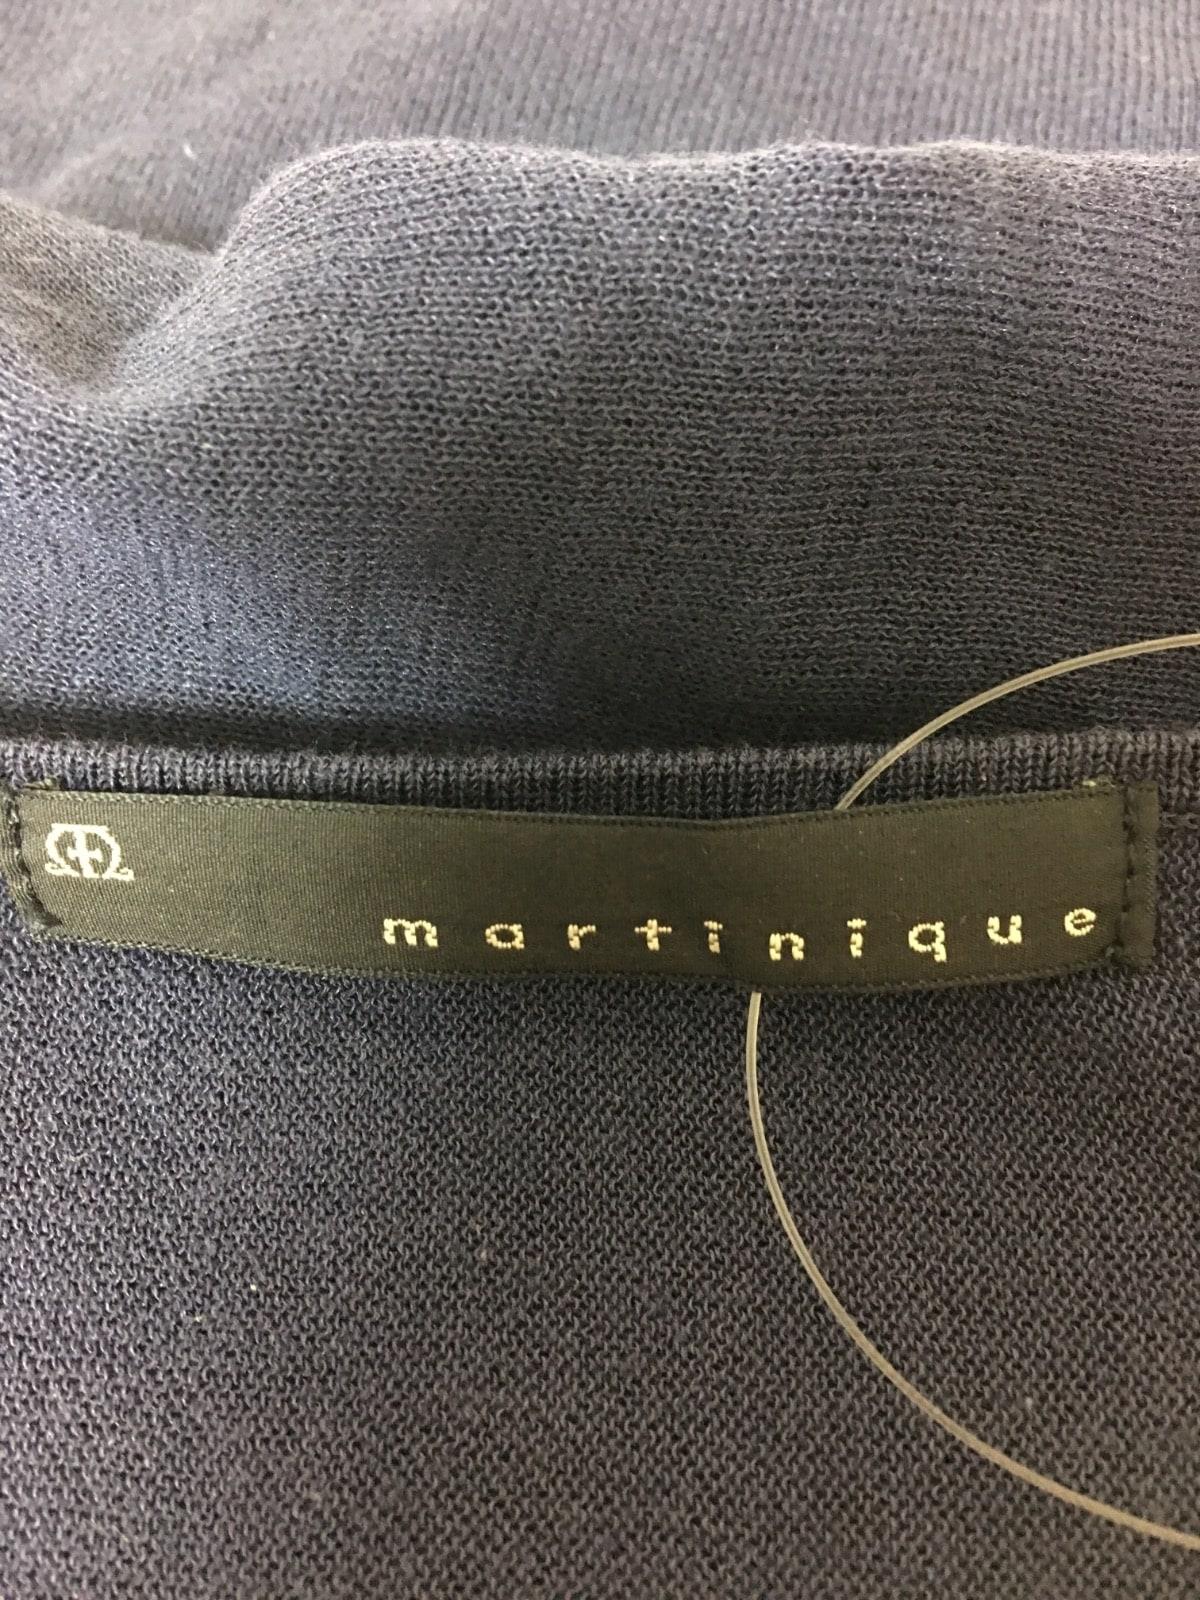 martinique(マルティニーク)のセーター